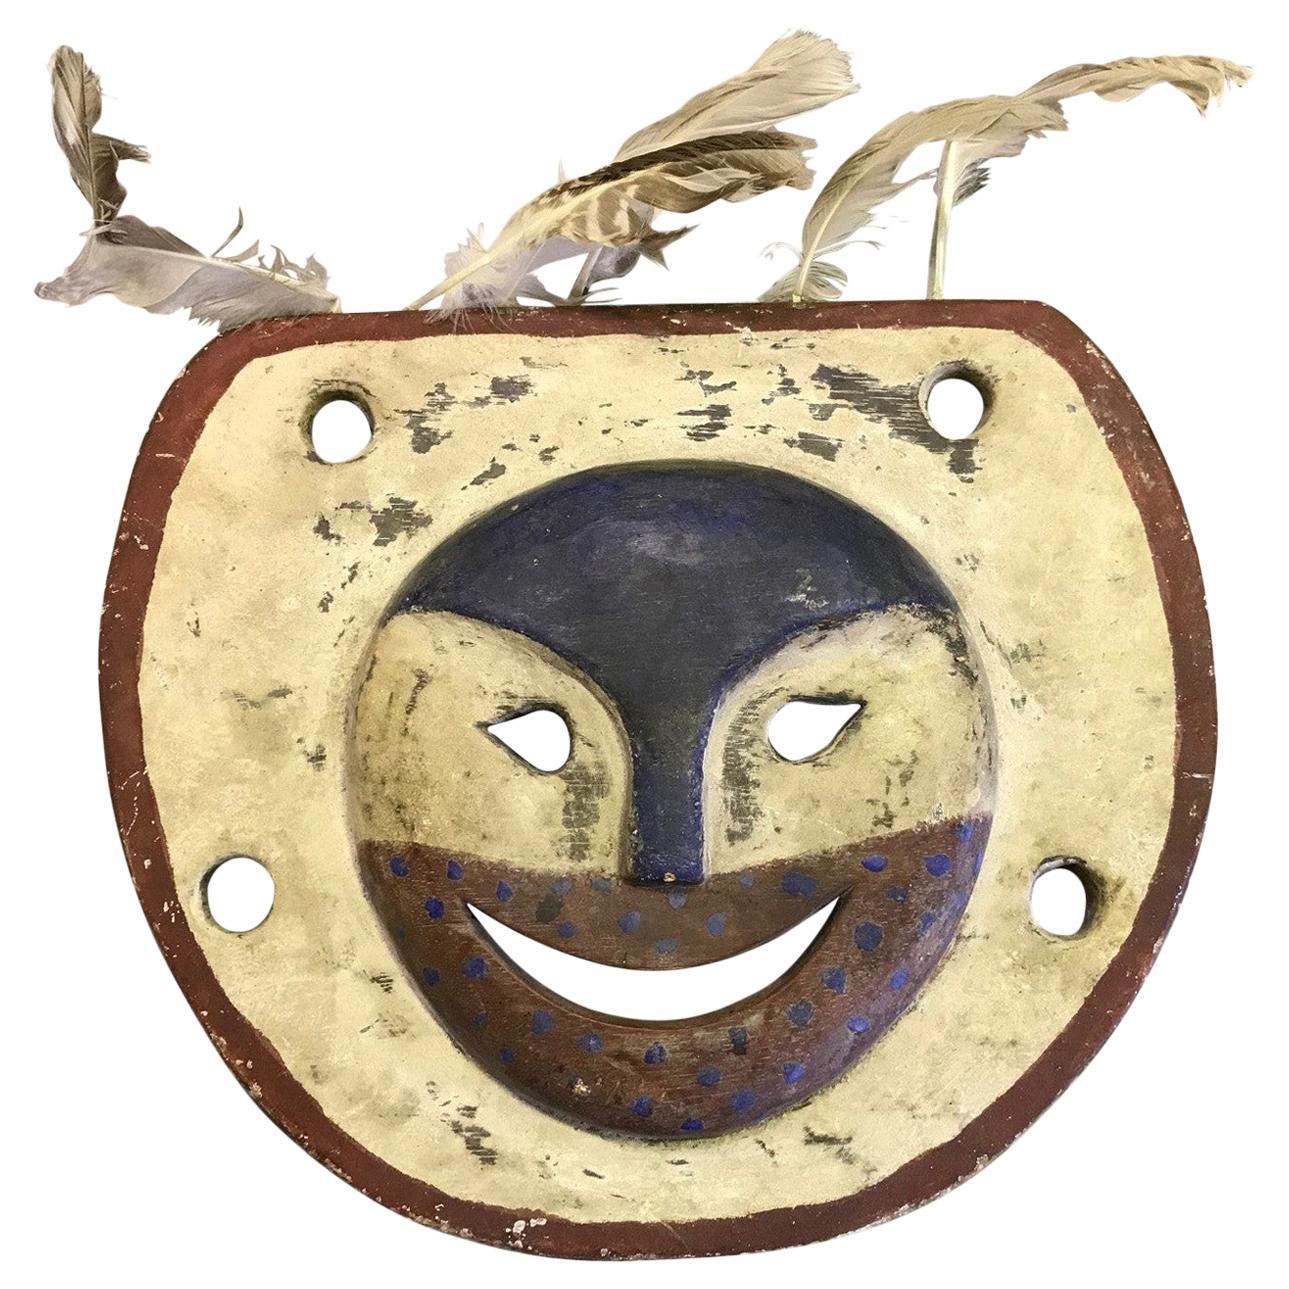 Yupik Yup'ik Native American Alaska Polychrome Wood Anthropomorphic Spirit Mask